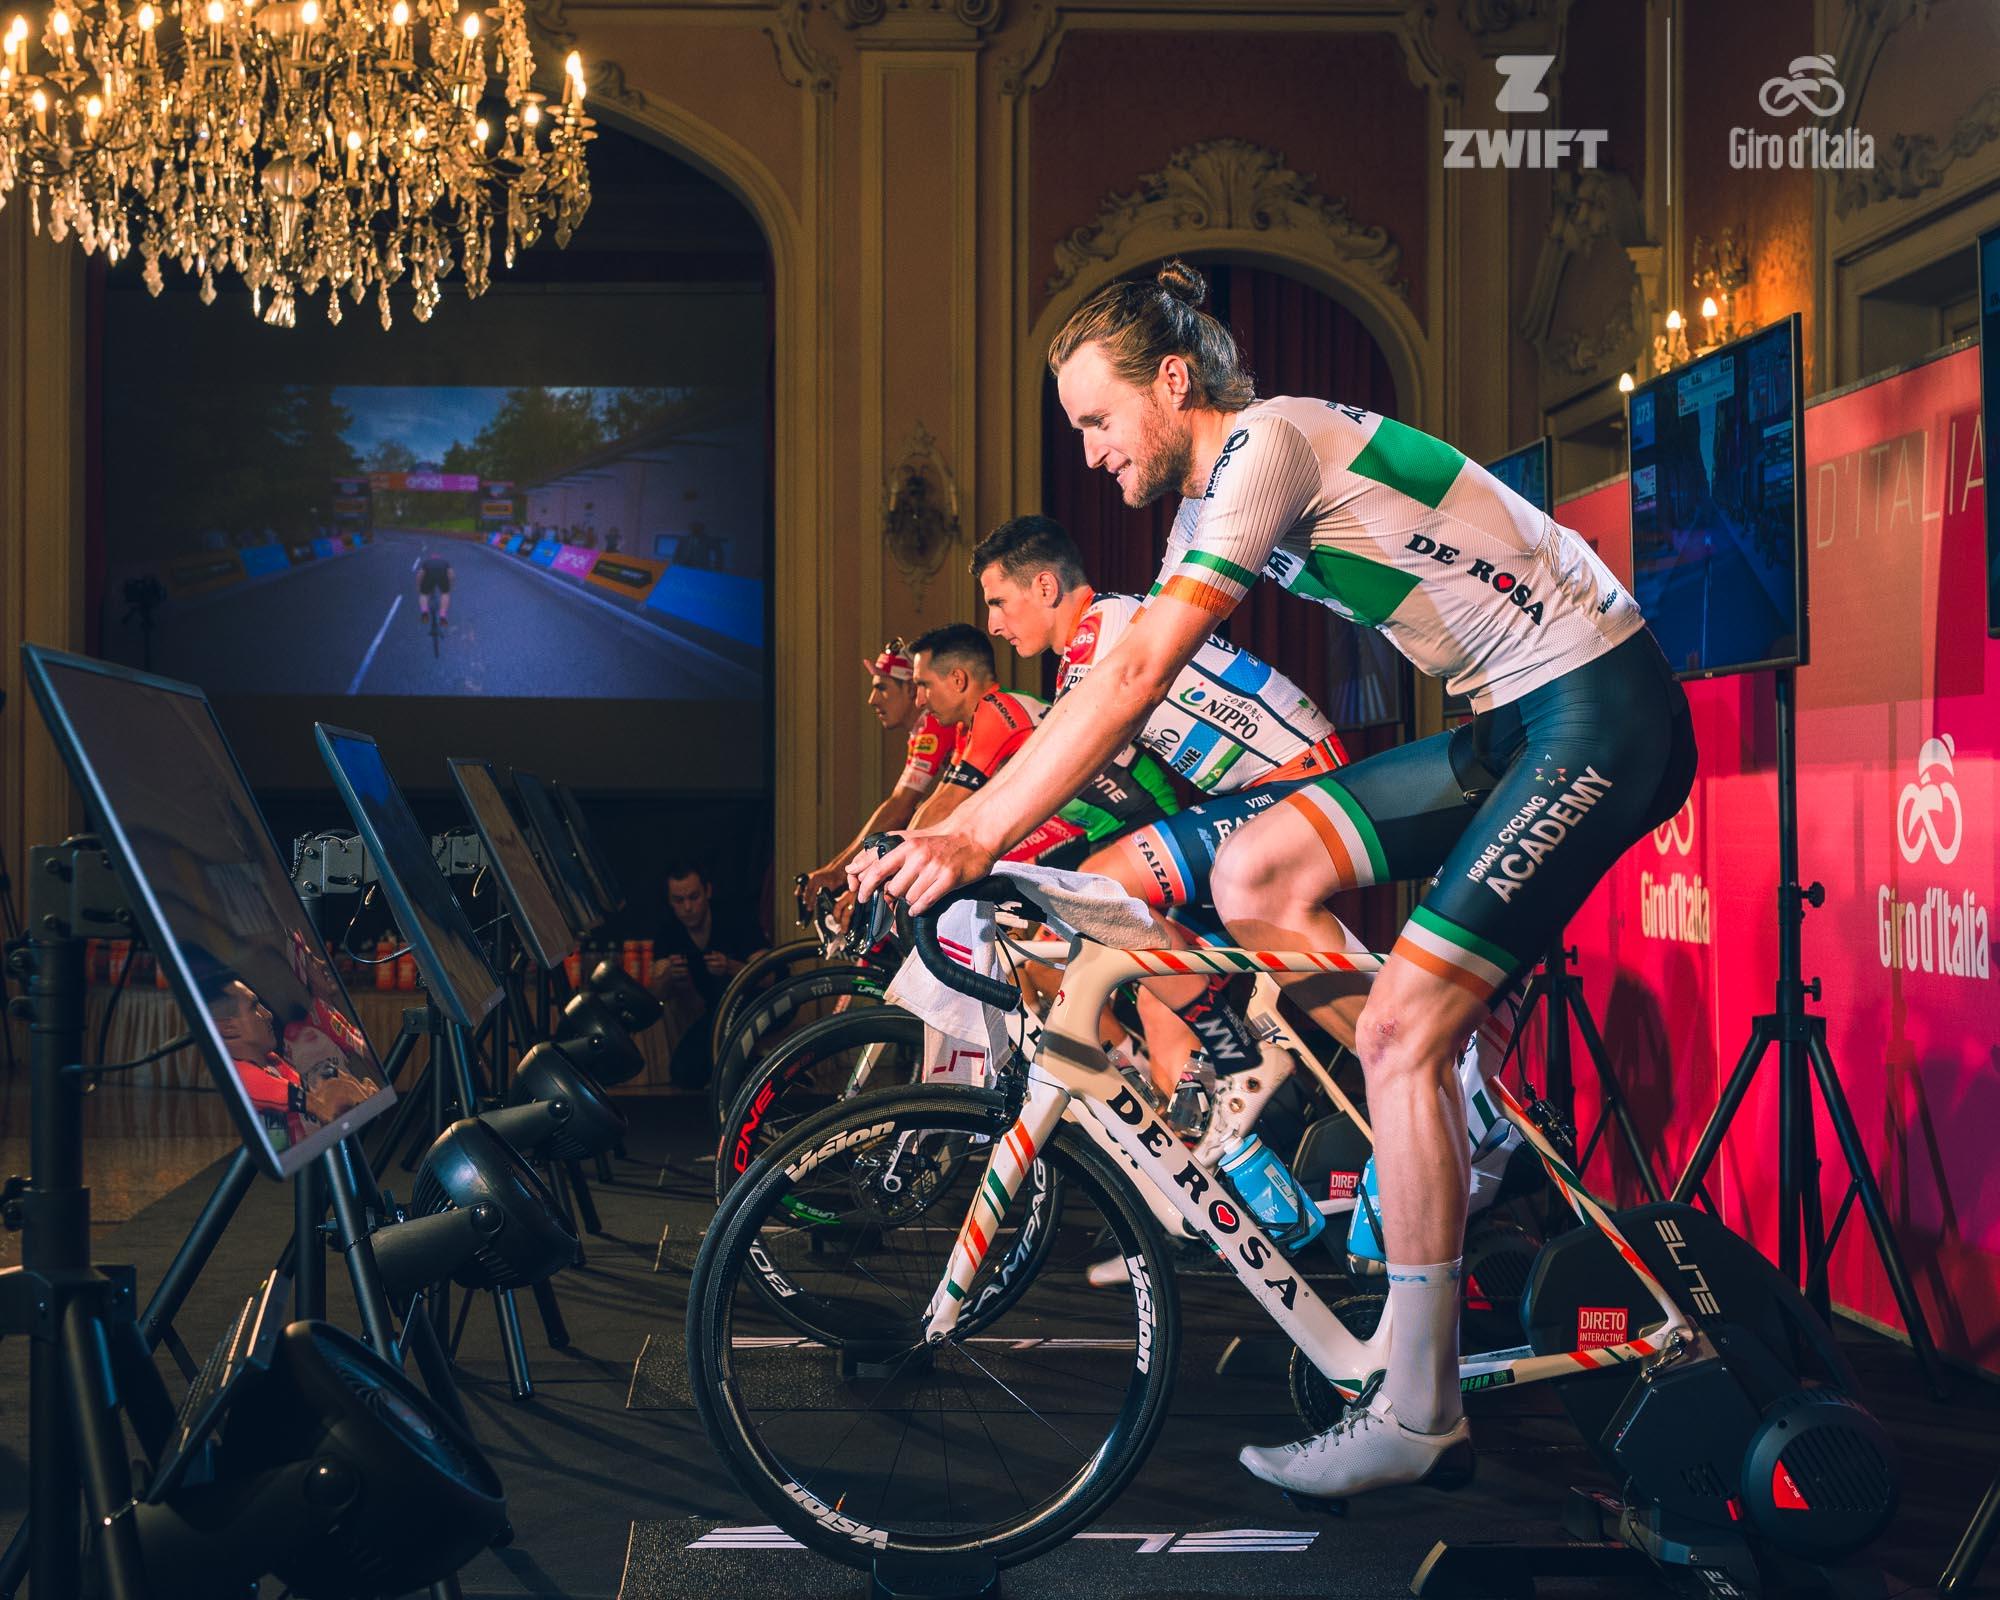 Giro d'Italia   Zwift